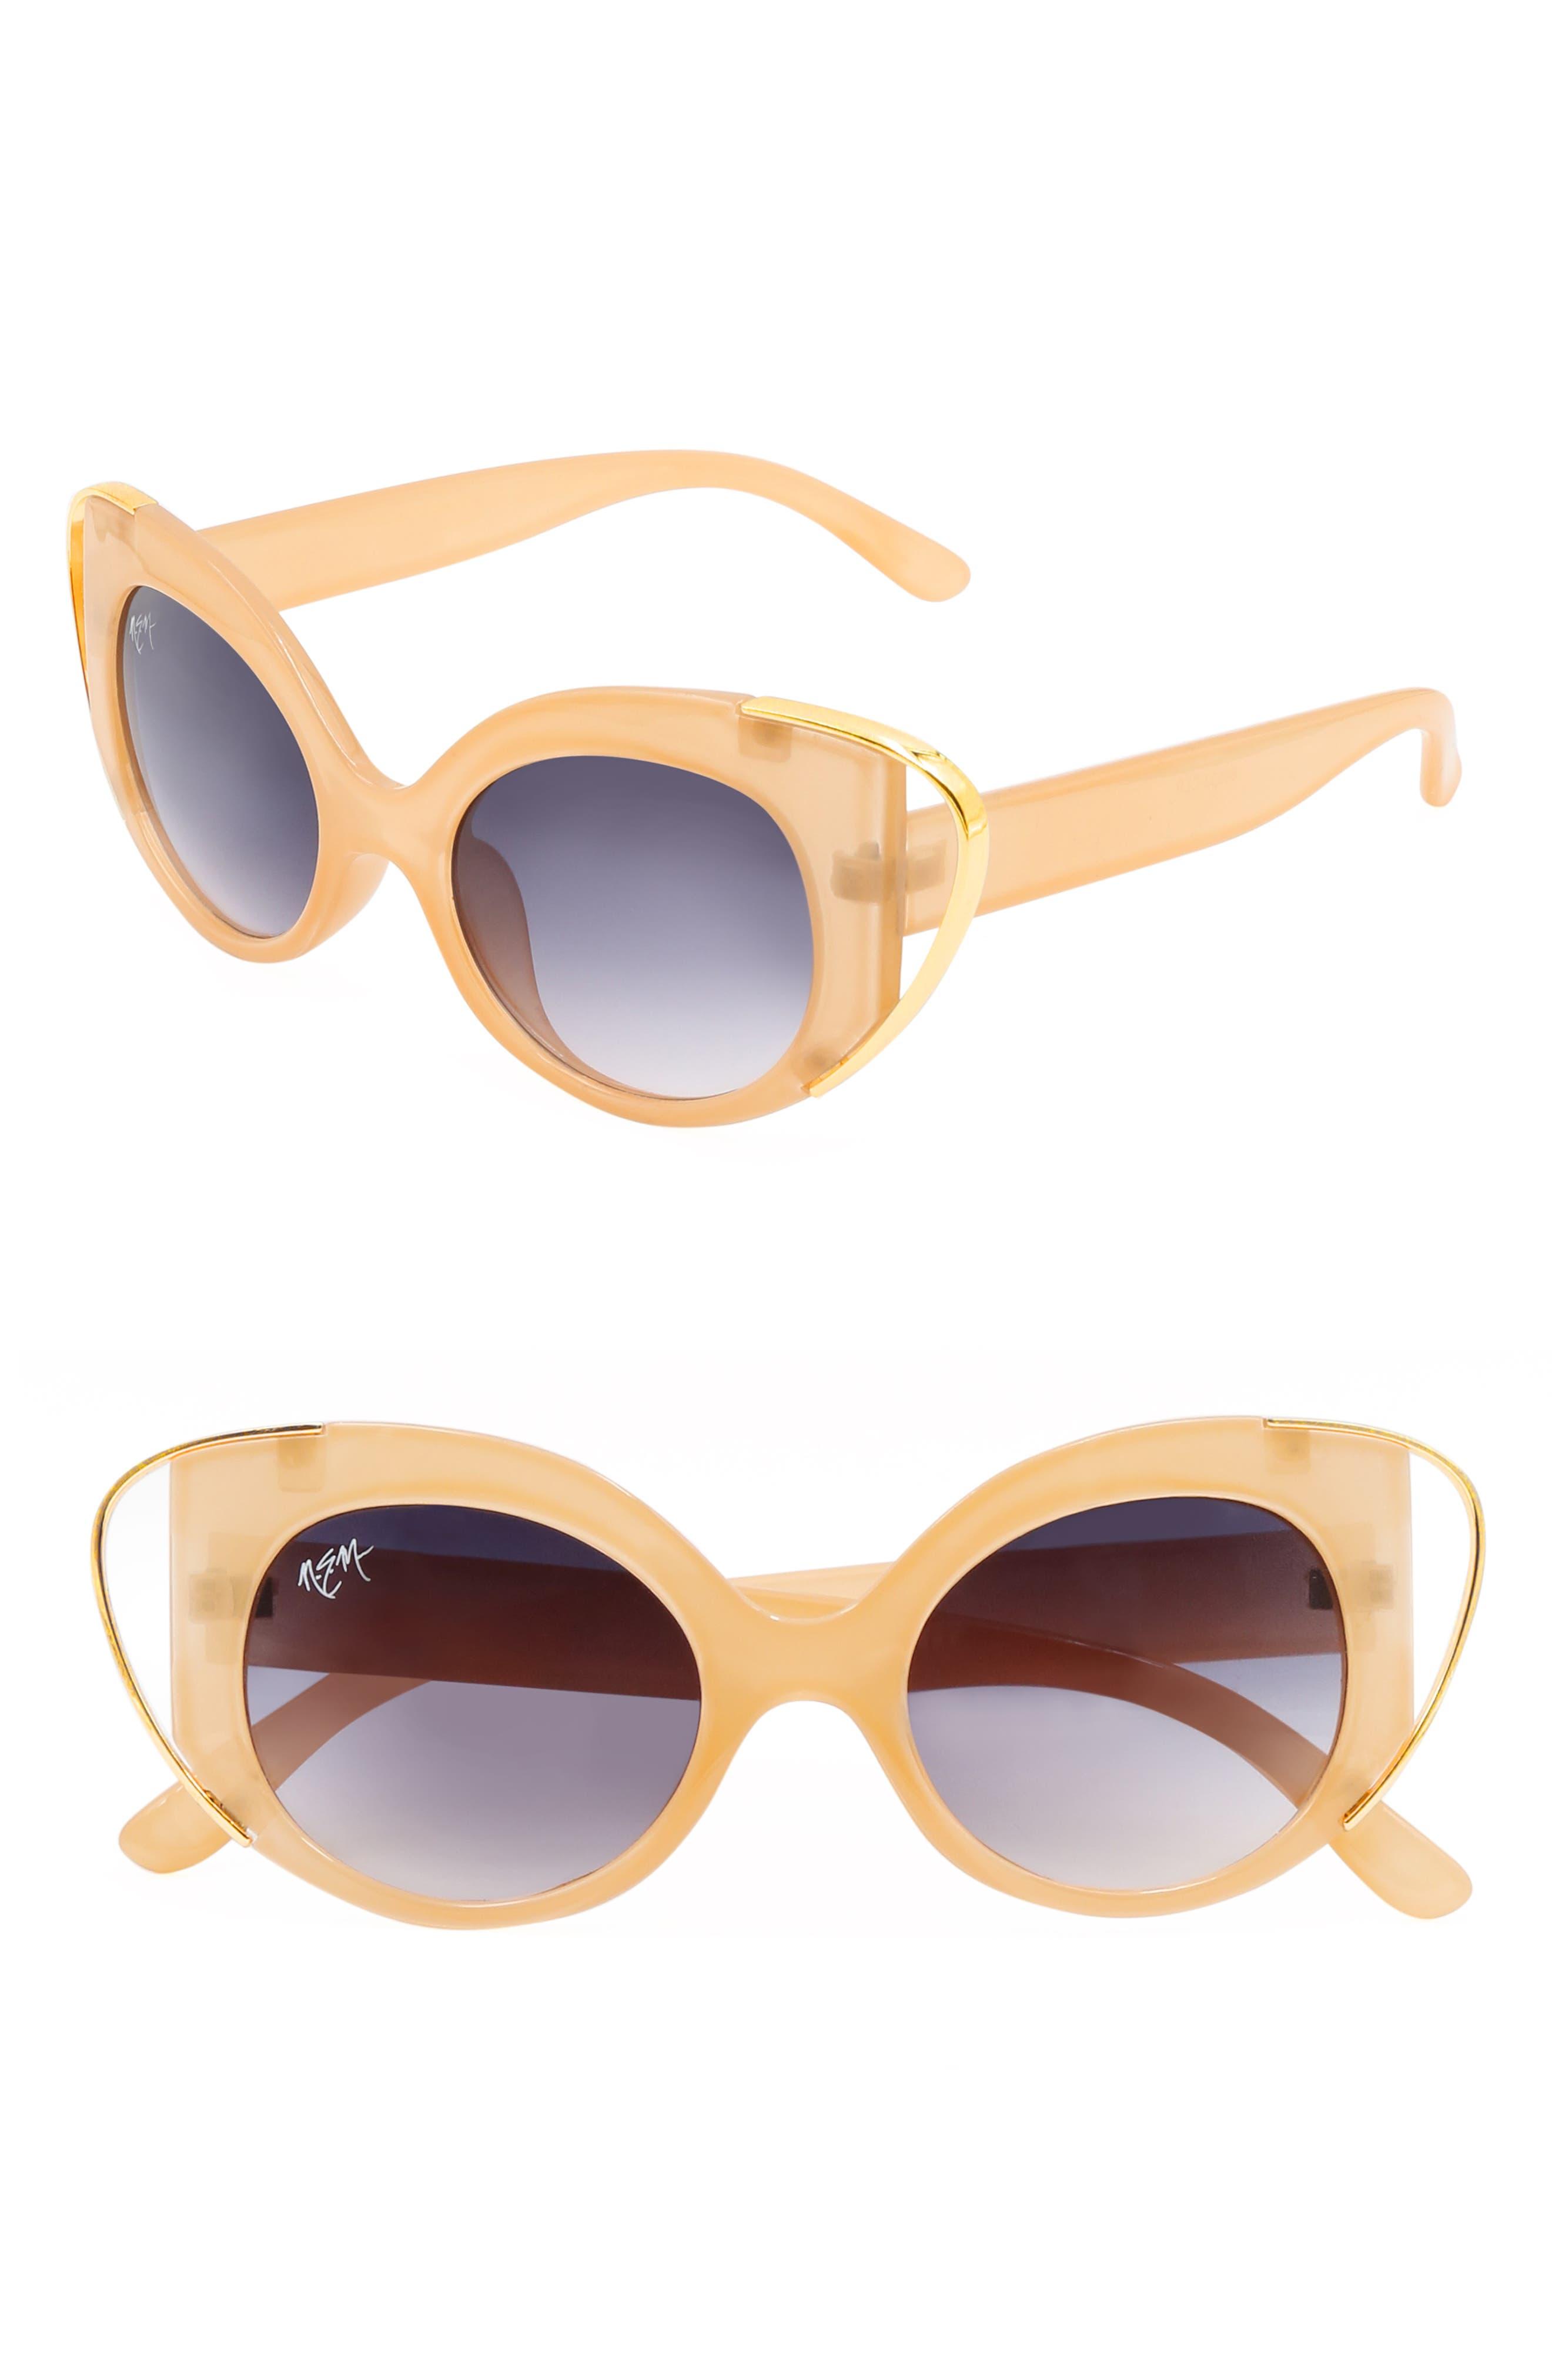 Nem Audrey 50Mm Cutout Cat Eye Sunglasses - Clear Yellow W Grey Gradient